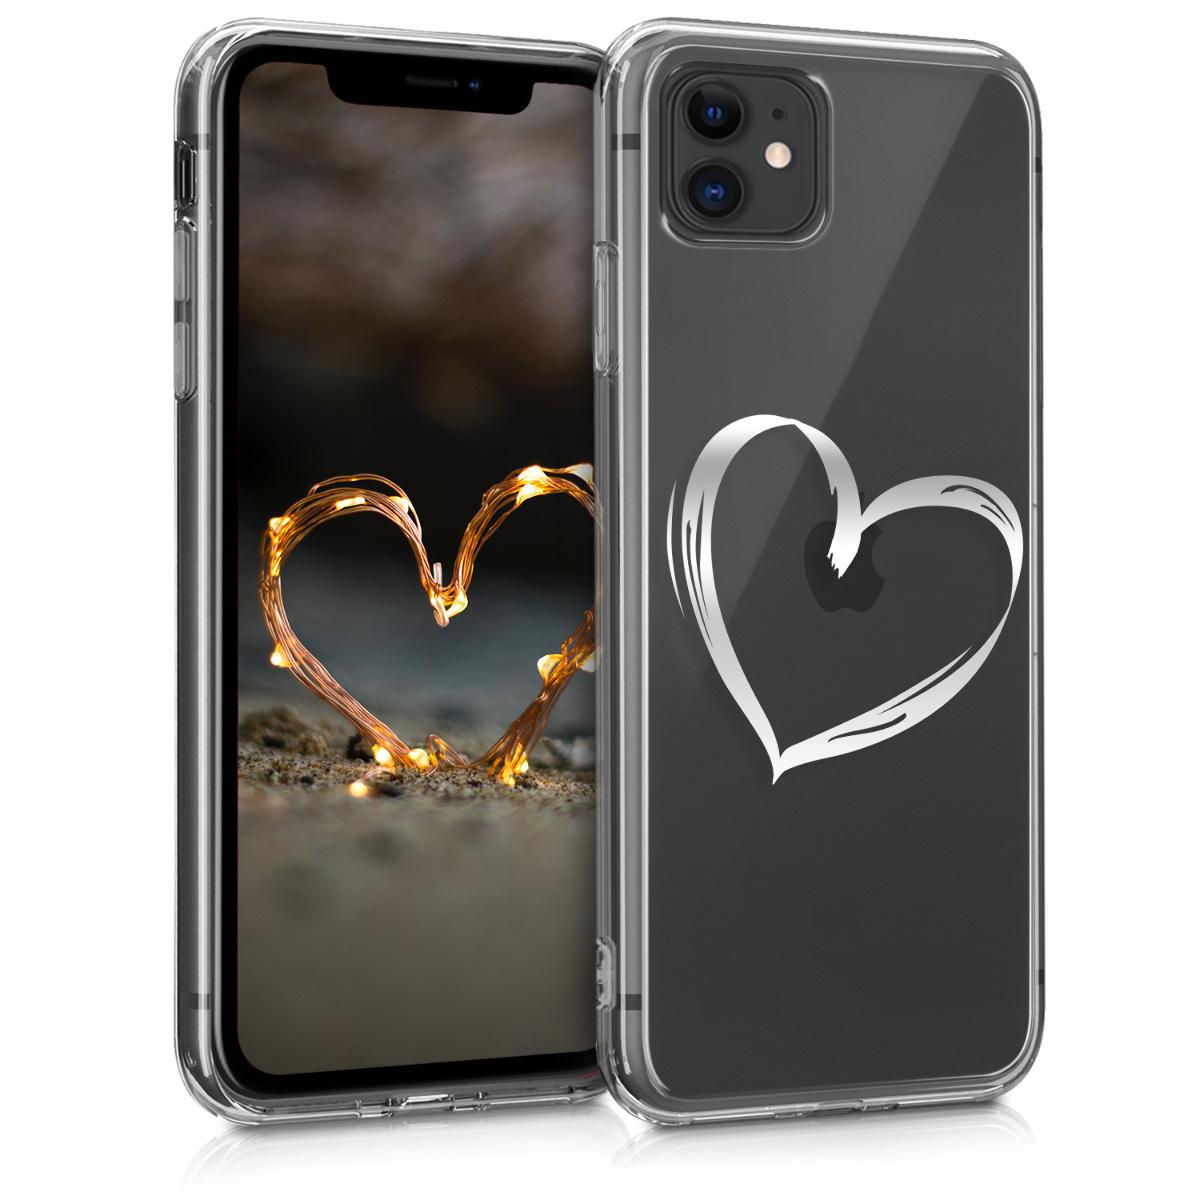 Kvalitní silikonové TPU pouzdro pro Apple iPhone 11 - Brushed Heart Silver | Transparent